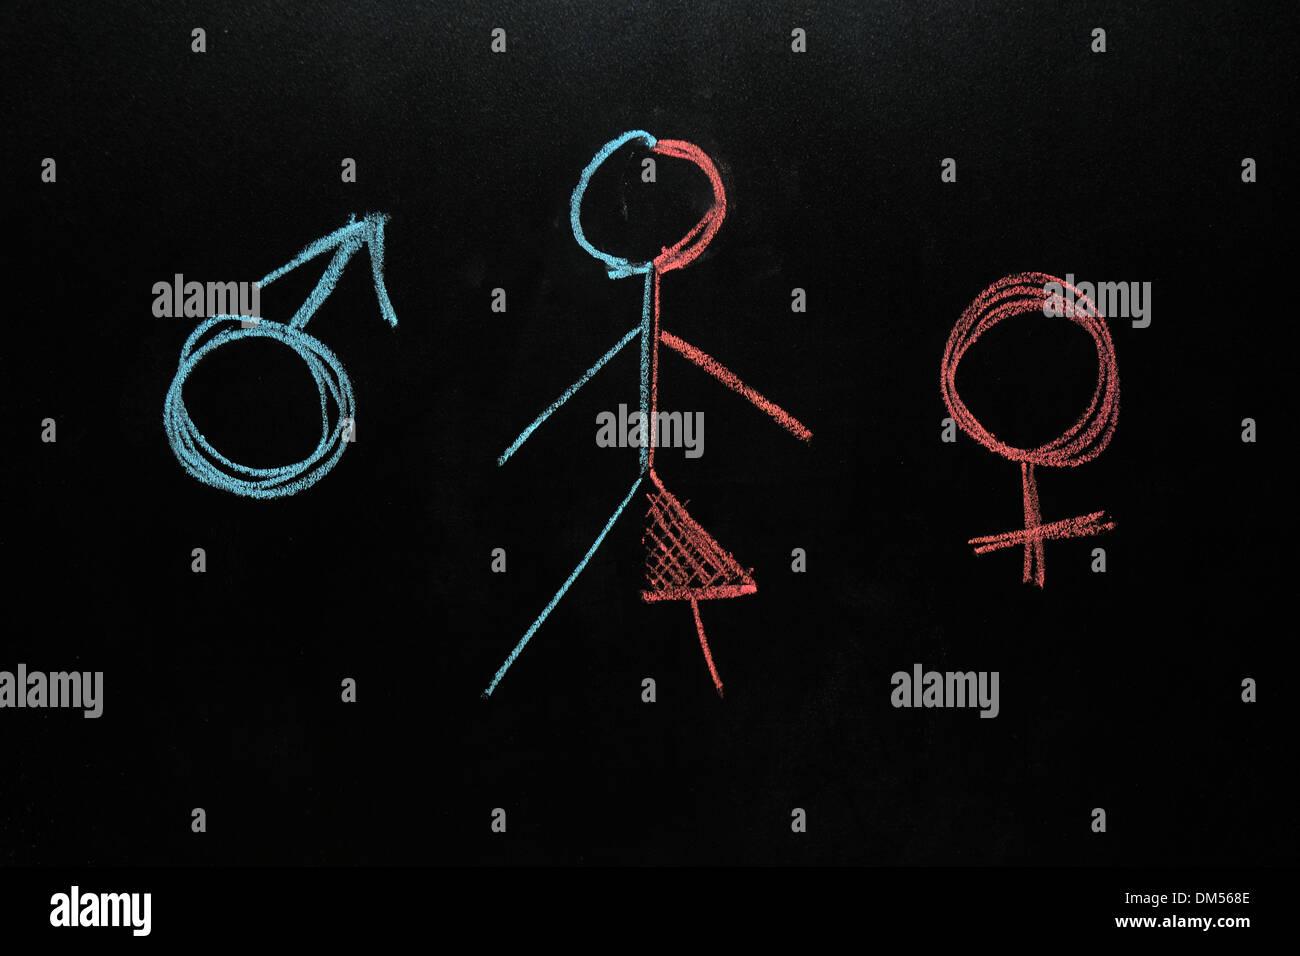 Female and male symbols with a half female half male stick figure drawn on a blackboard in chalk. - Stock Image